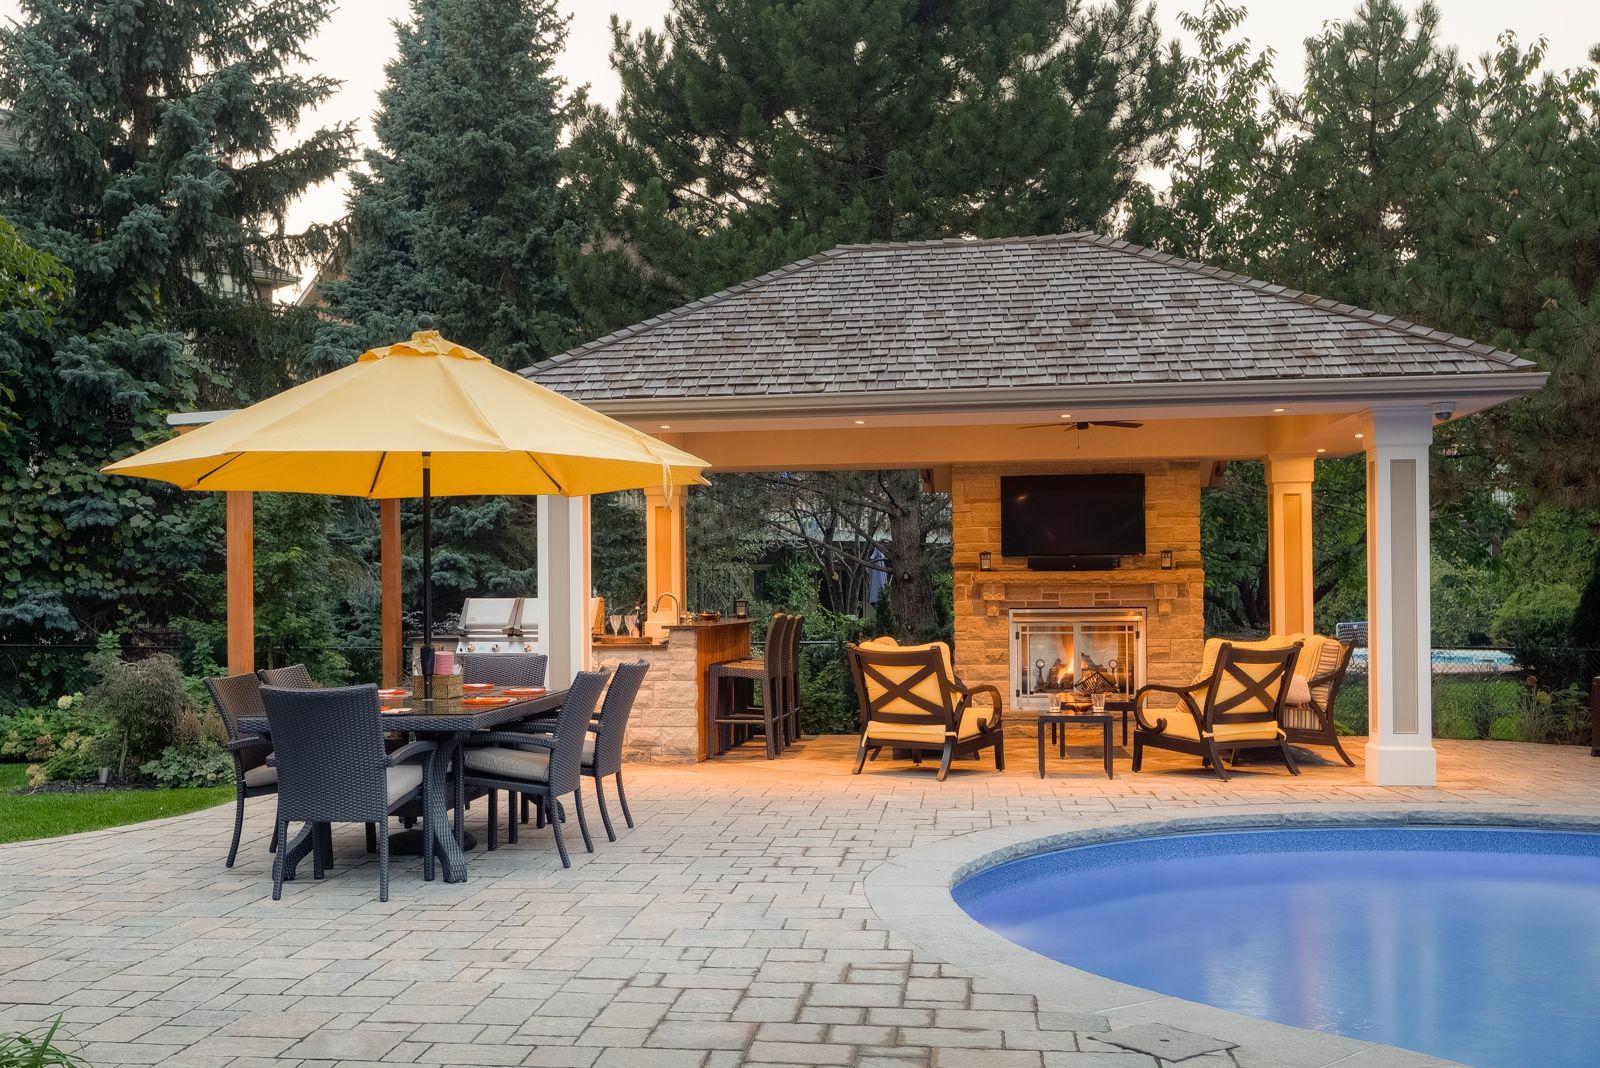 Cabana designs landscape design build cabanas and pool for Pool cabana designs